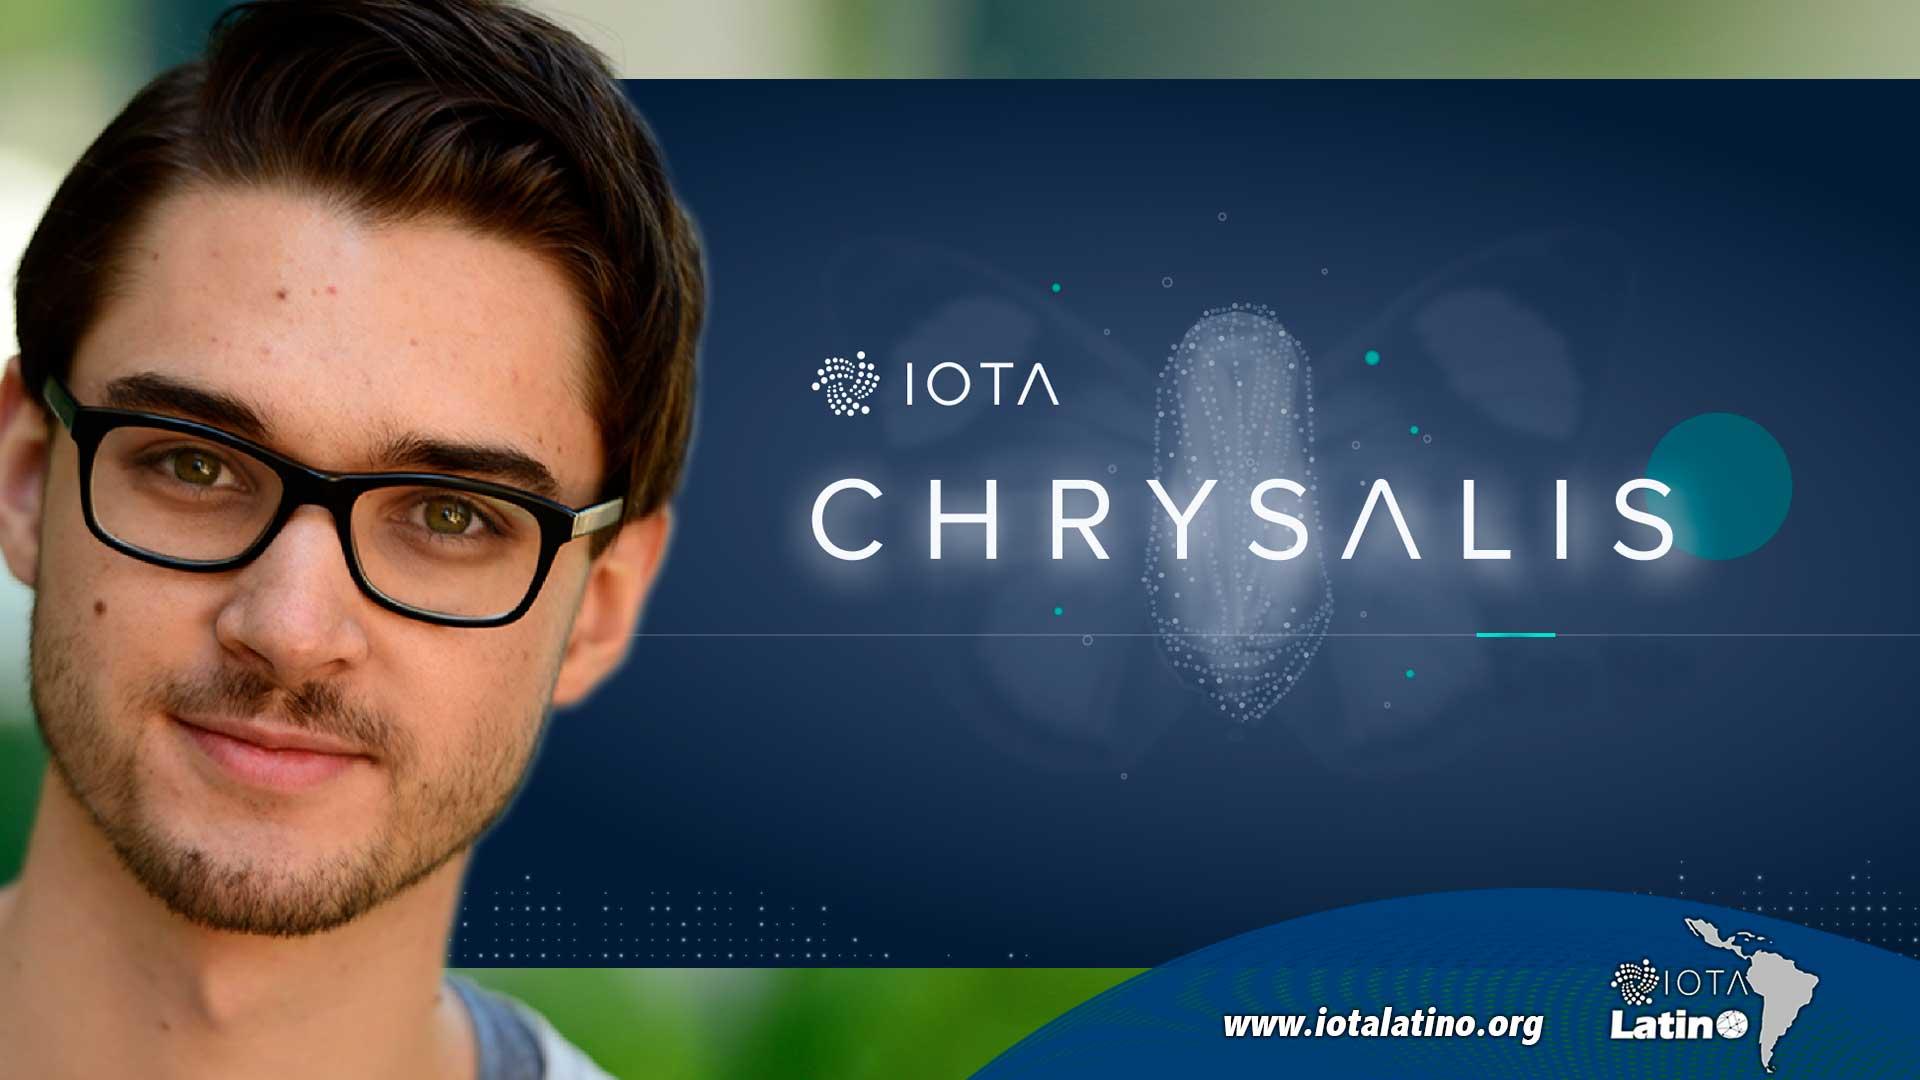 Chrysalis - IOTA Latino